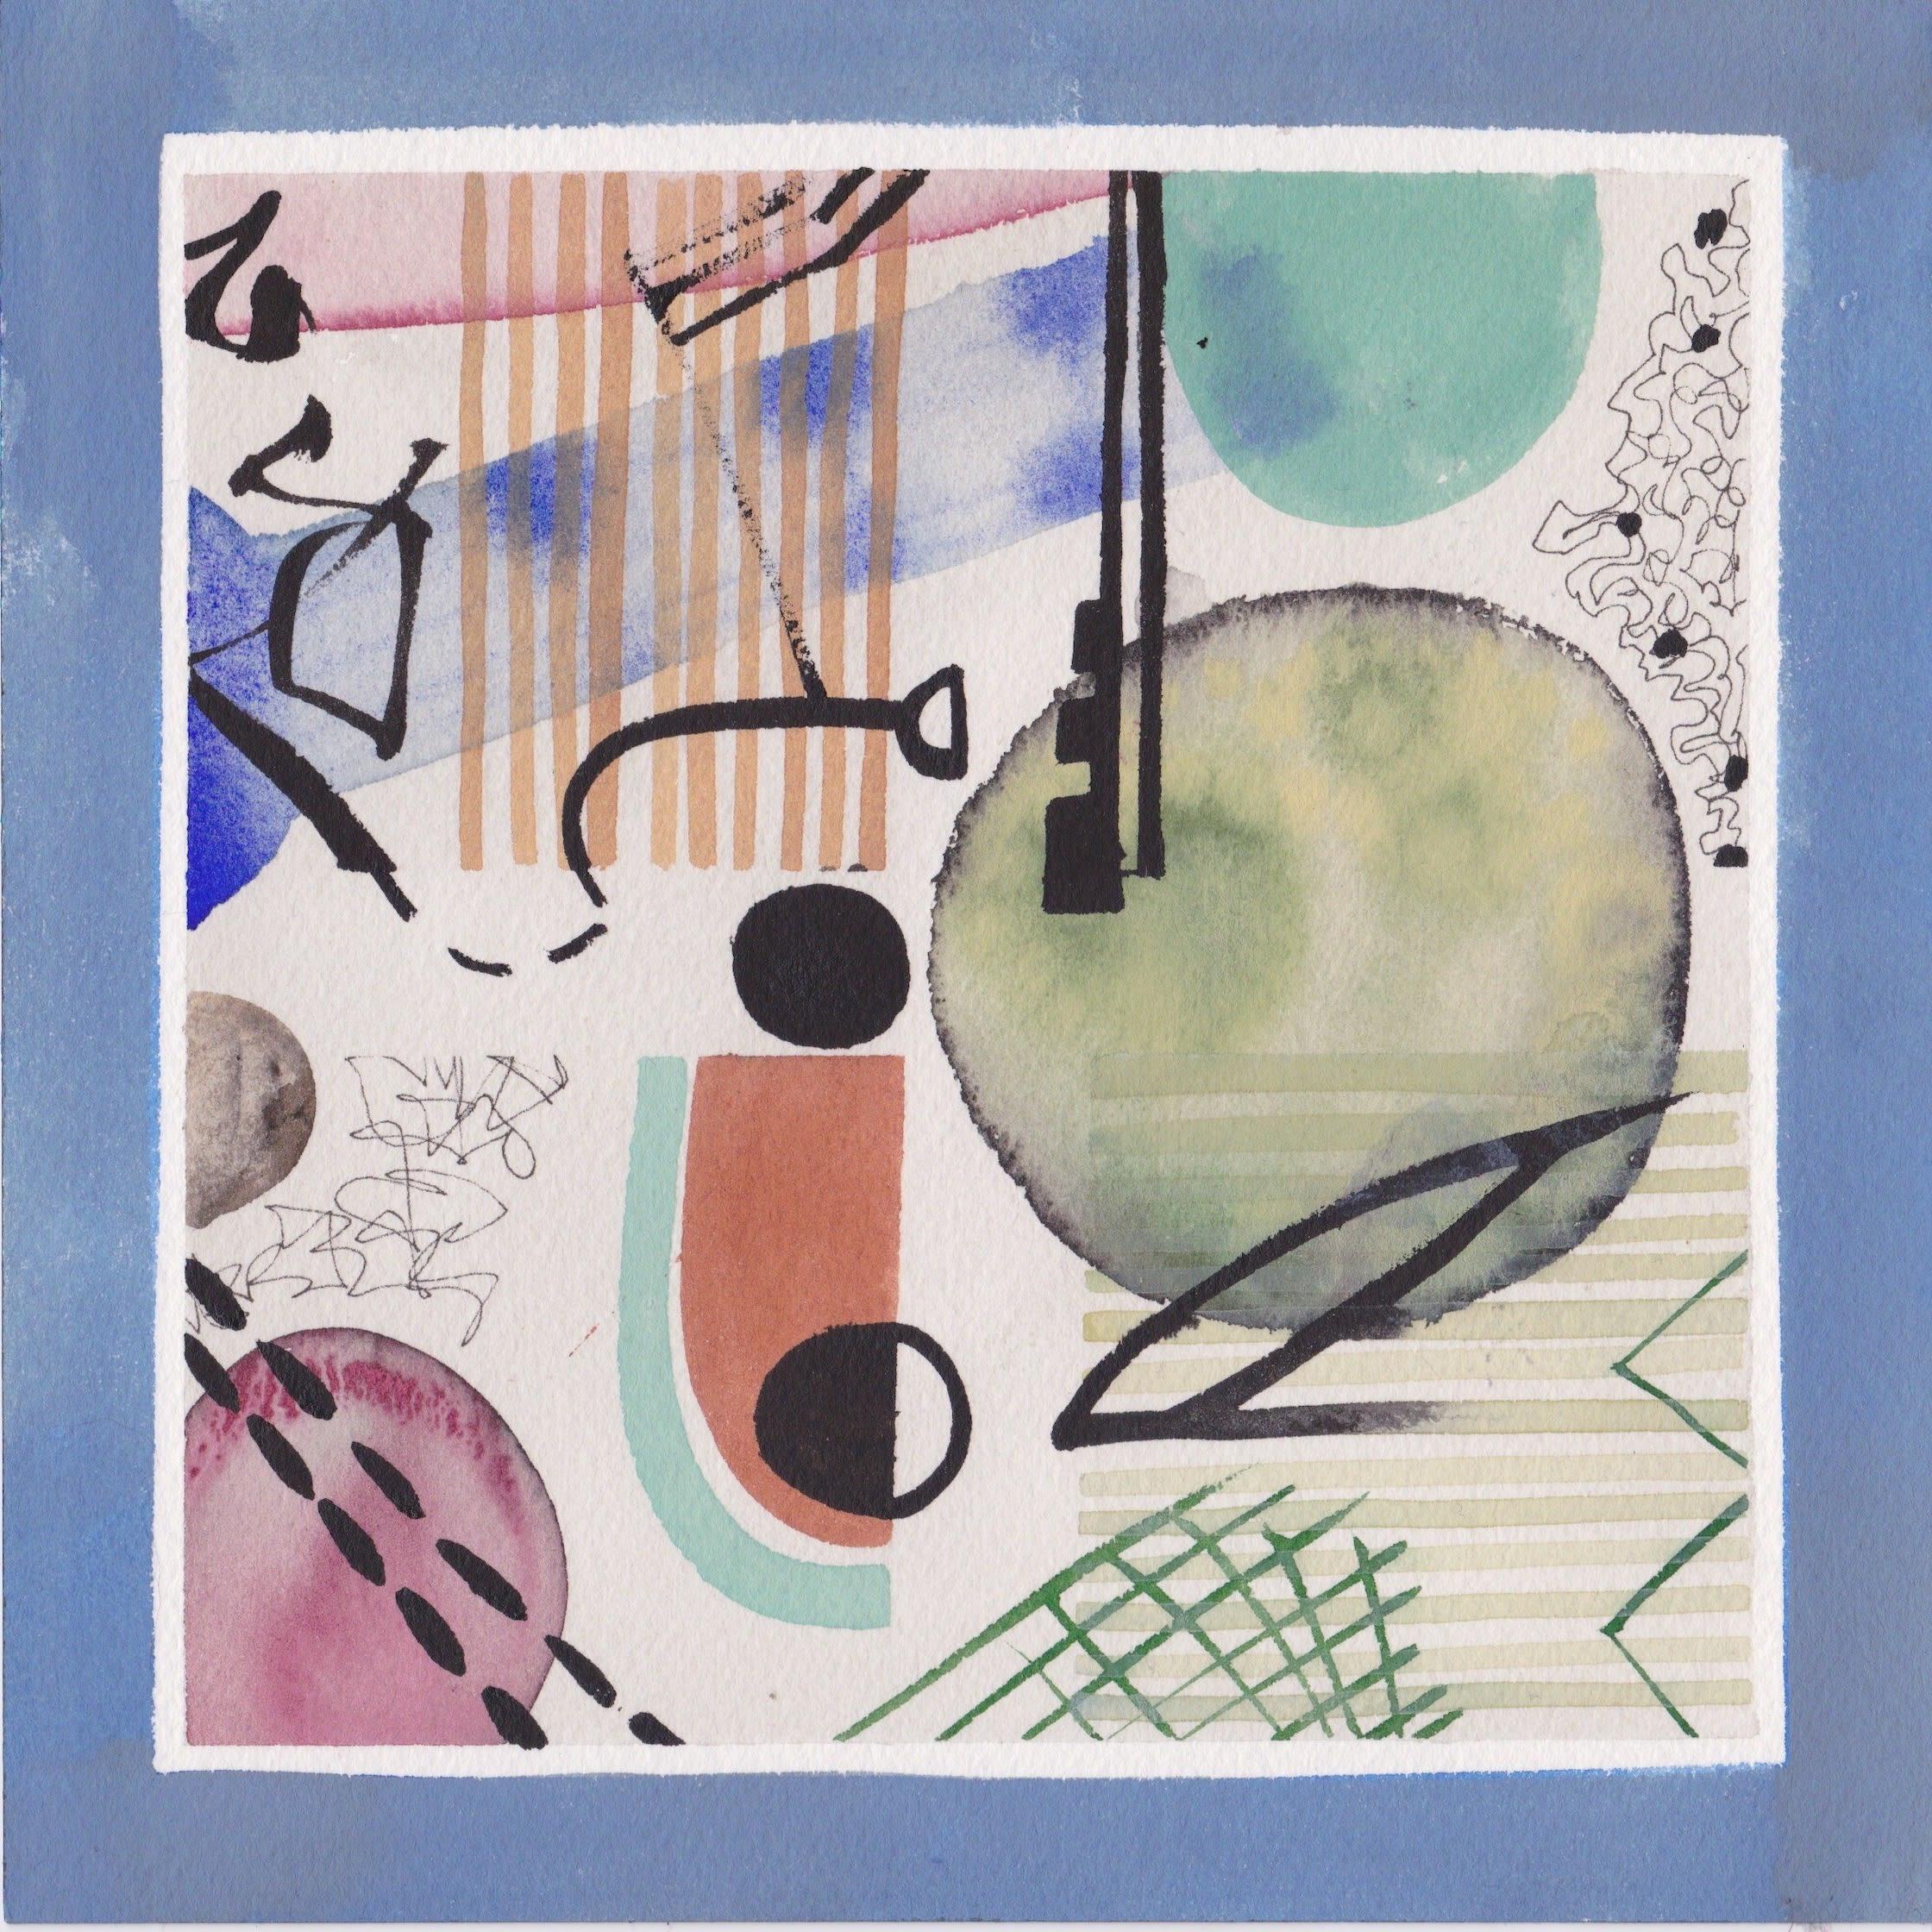 "<span class=""link fancybox-details-link""><a href=""/artists/170-chloe-fremantle/works/12376-chloe-fremantle-evocations-no-7/"">View Detail Page</a></span><div class=""artist""><span class=""artist""><strong>Chloe Fremantle</strong></span></div><div class=""title""><em>Evocations No 7</em></div><div class=""medium"">gouache & collage</div><div class=""dimensions"">Frame: 32 x 32 cm<br /> Artwork: 20 x 20 cm</div><div class=""price"">£275.00</div>"